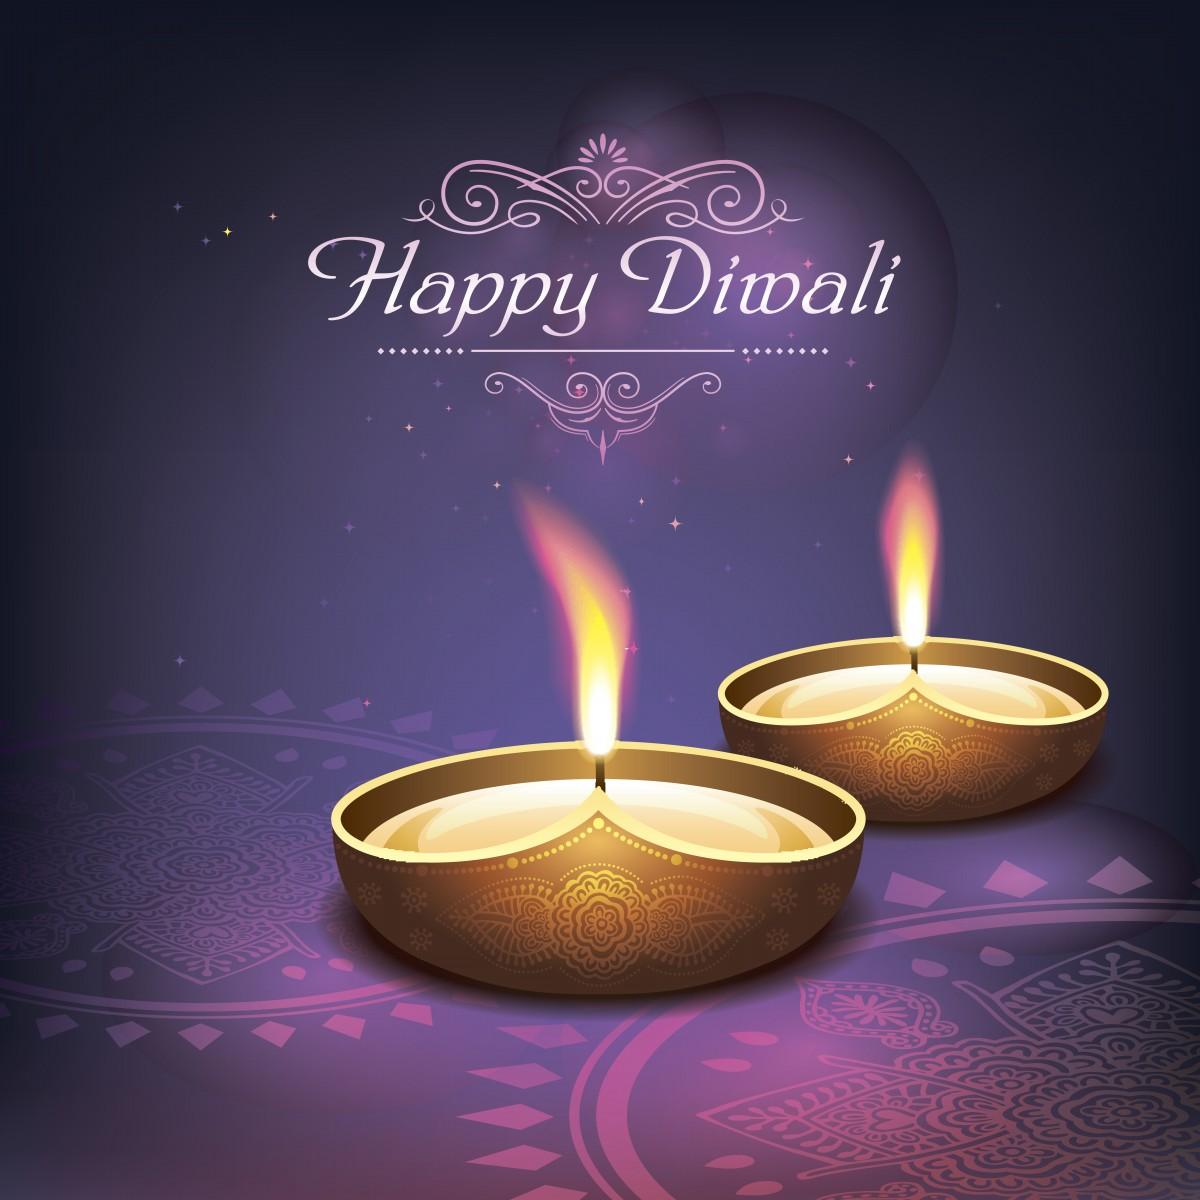 Choti Diwali 2016 Cards